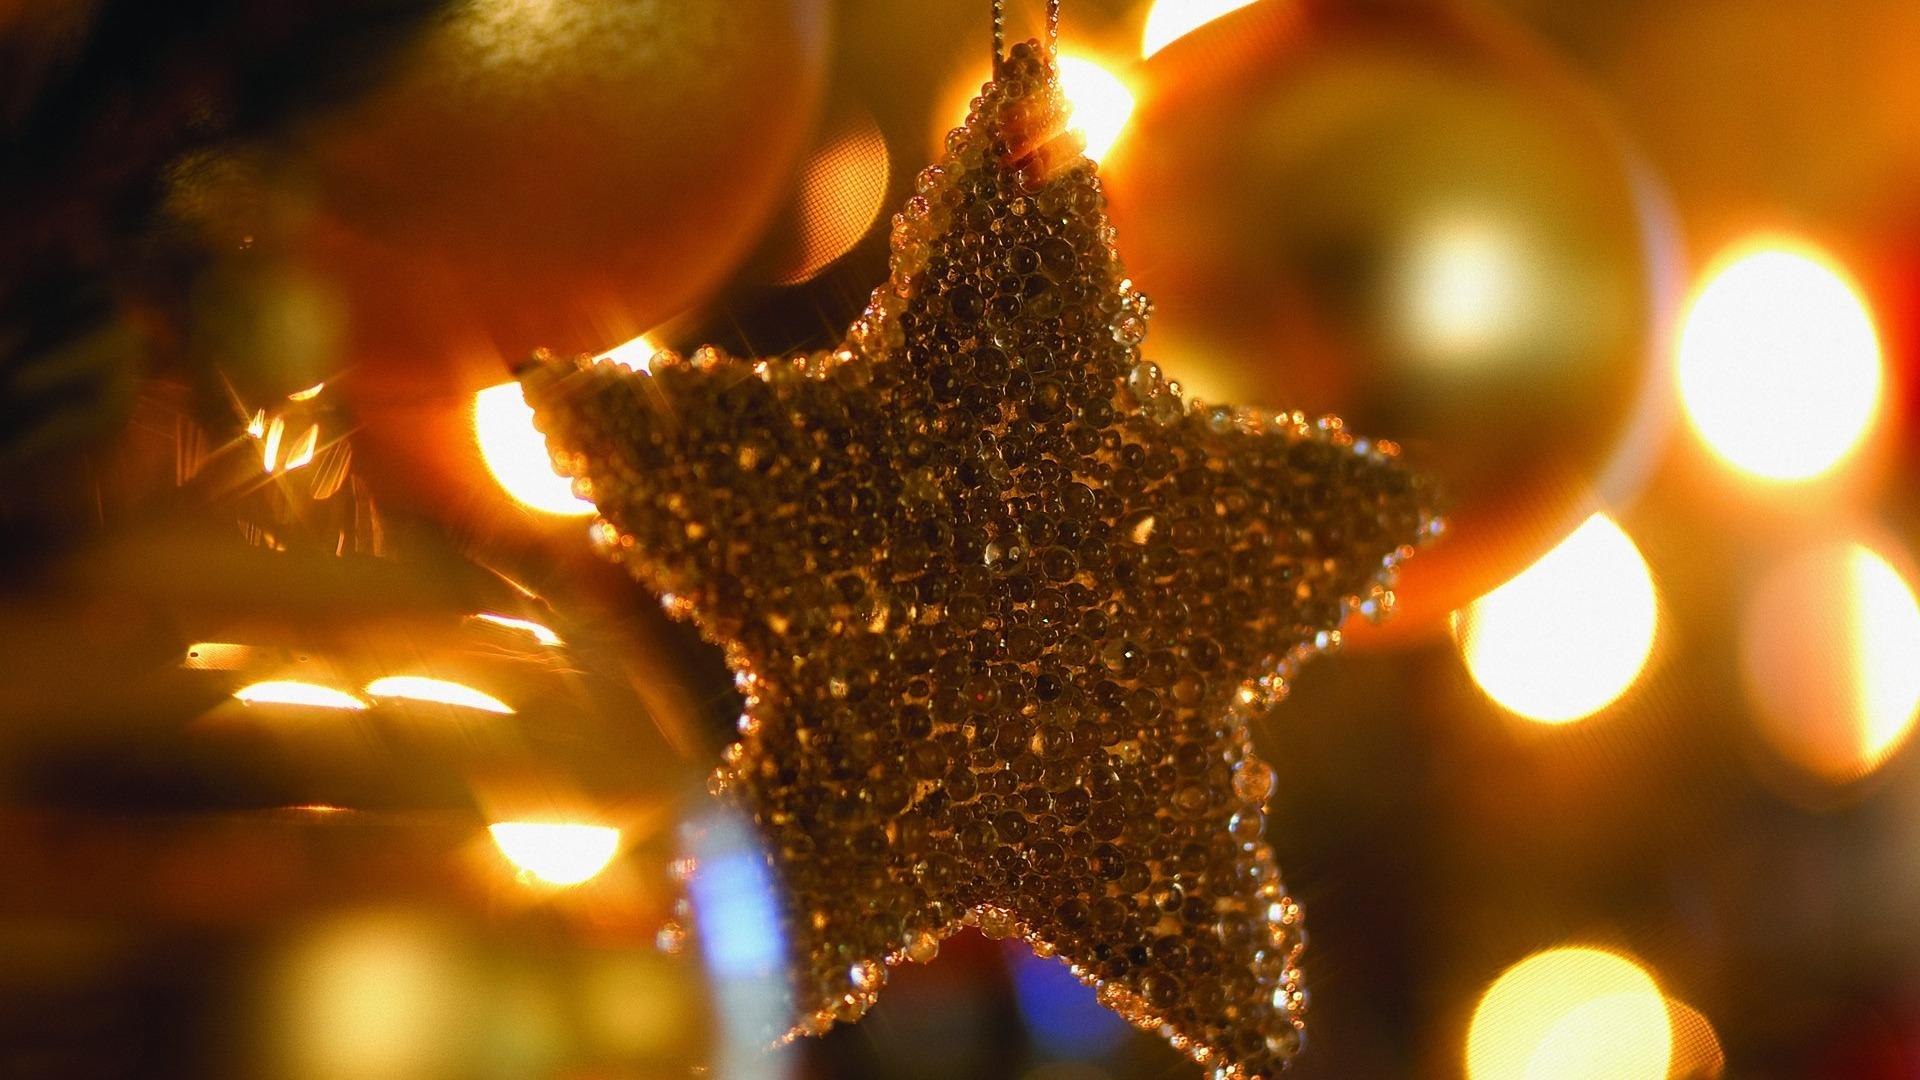 Christmas Star Christmas Tree Ornaments  1920x1080 Wallpaper Download